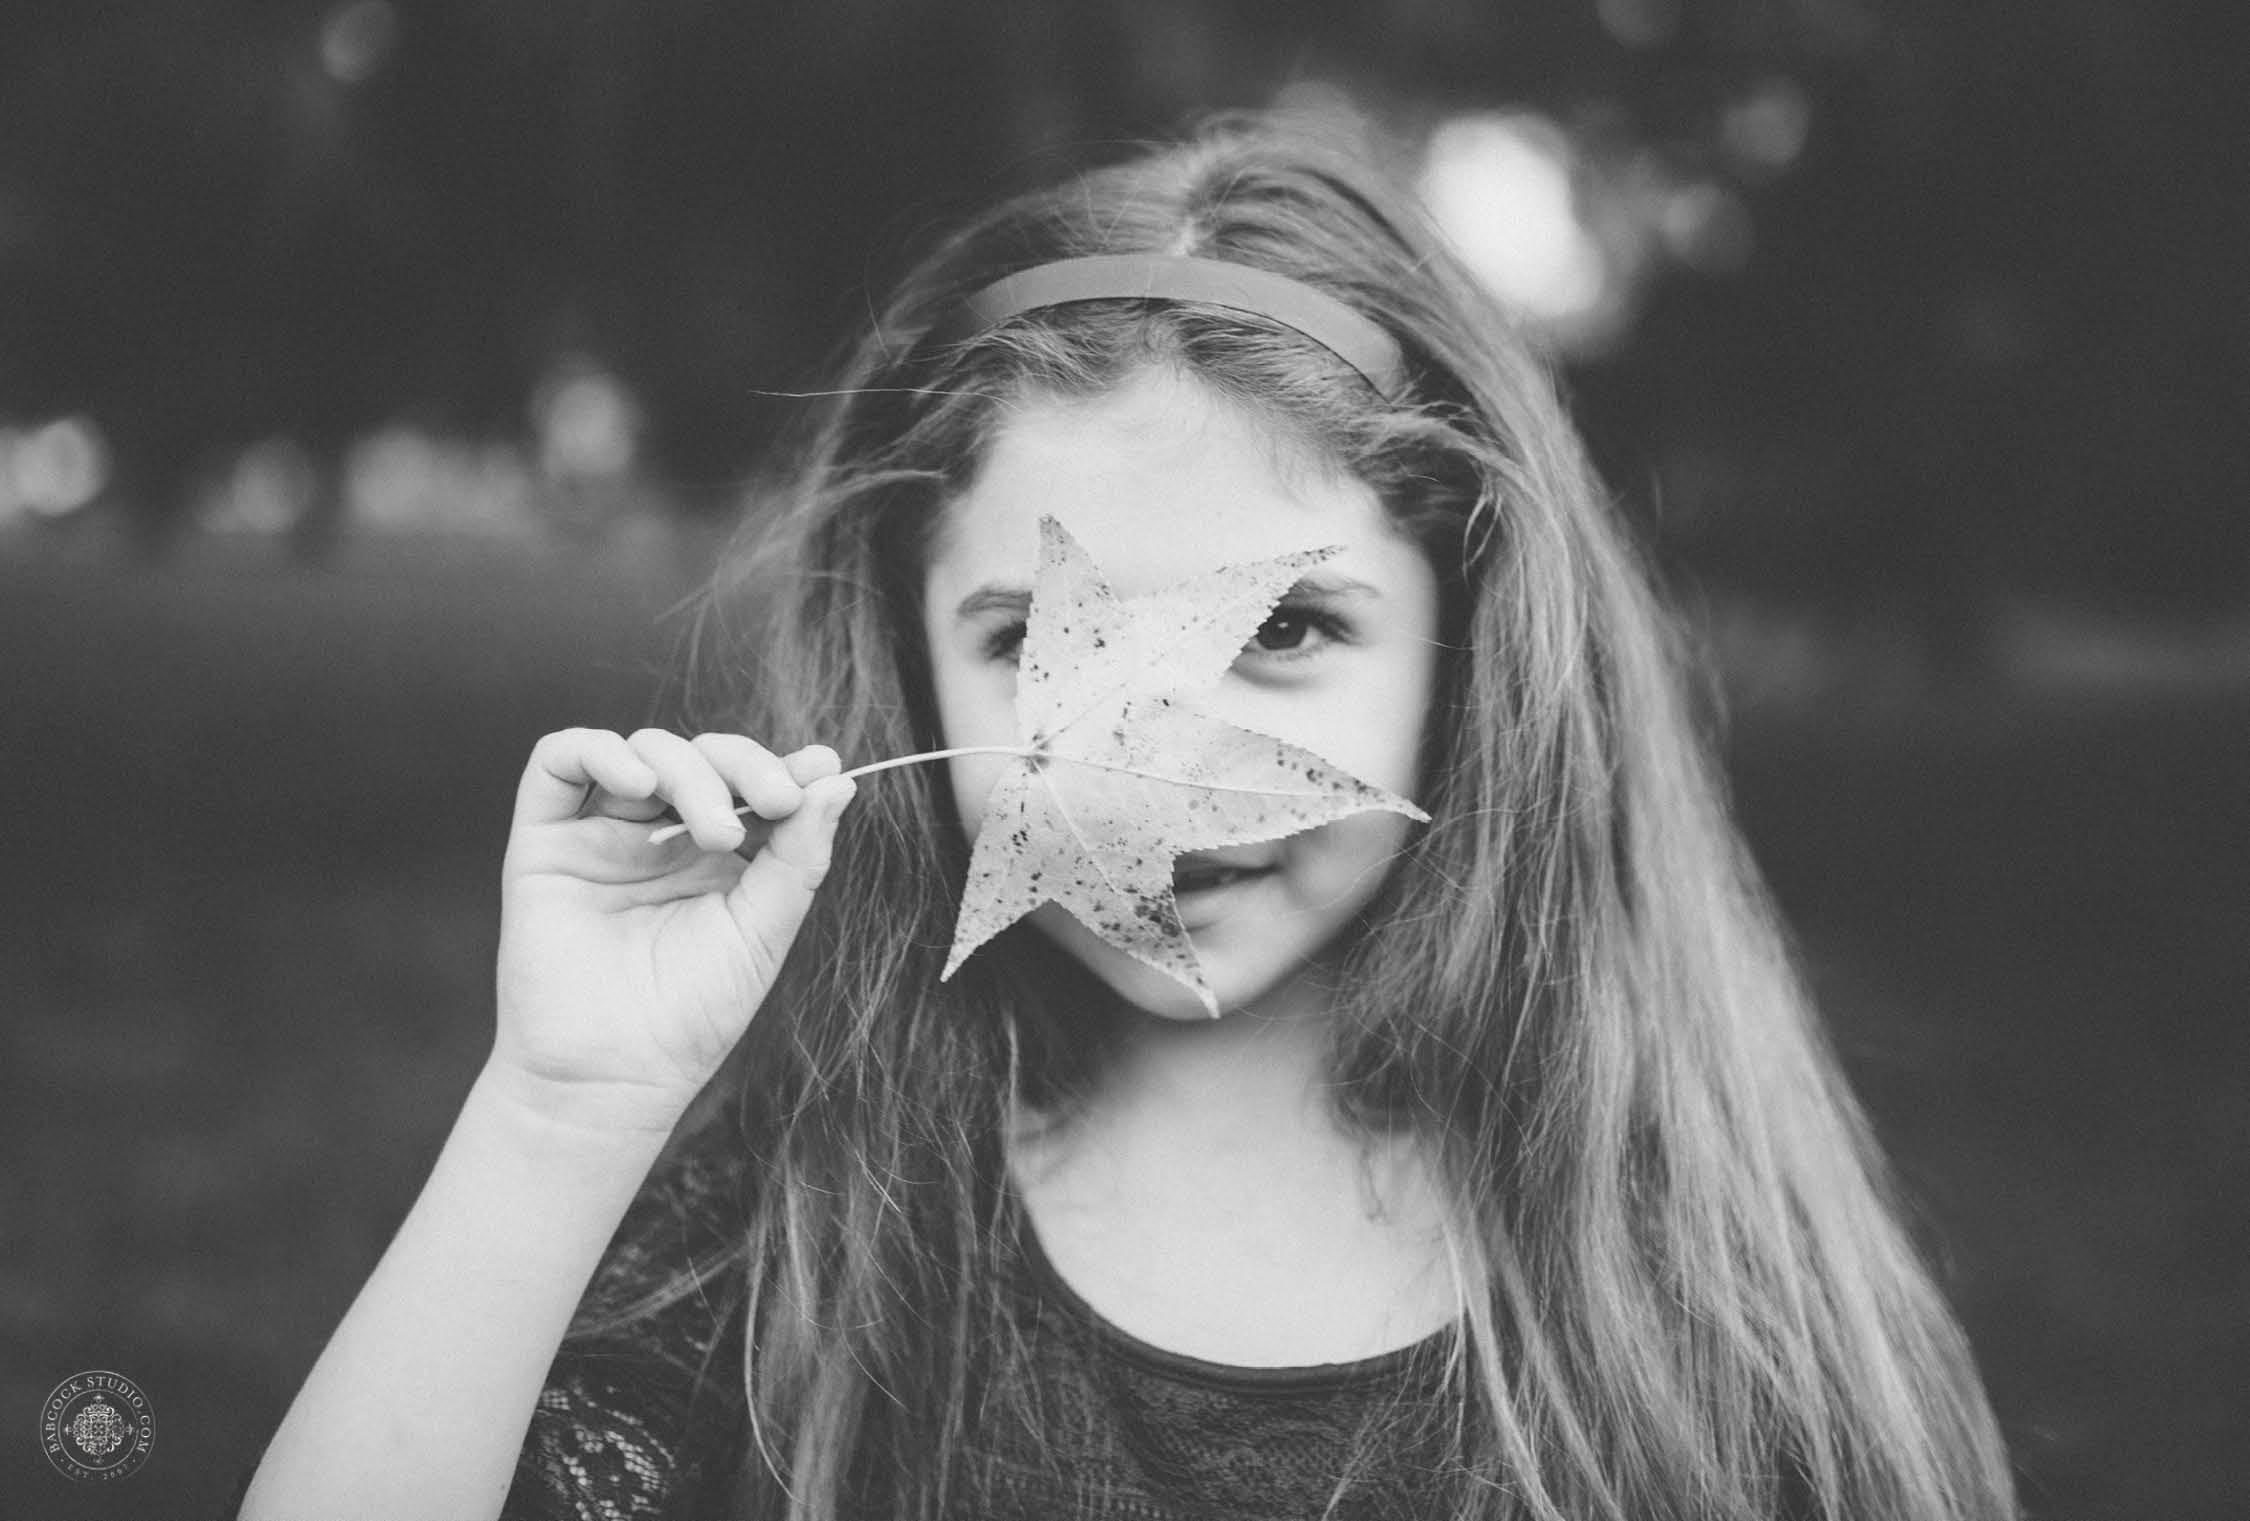 vance-family-children-photographer-dayton-ohio-16.jpg